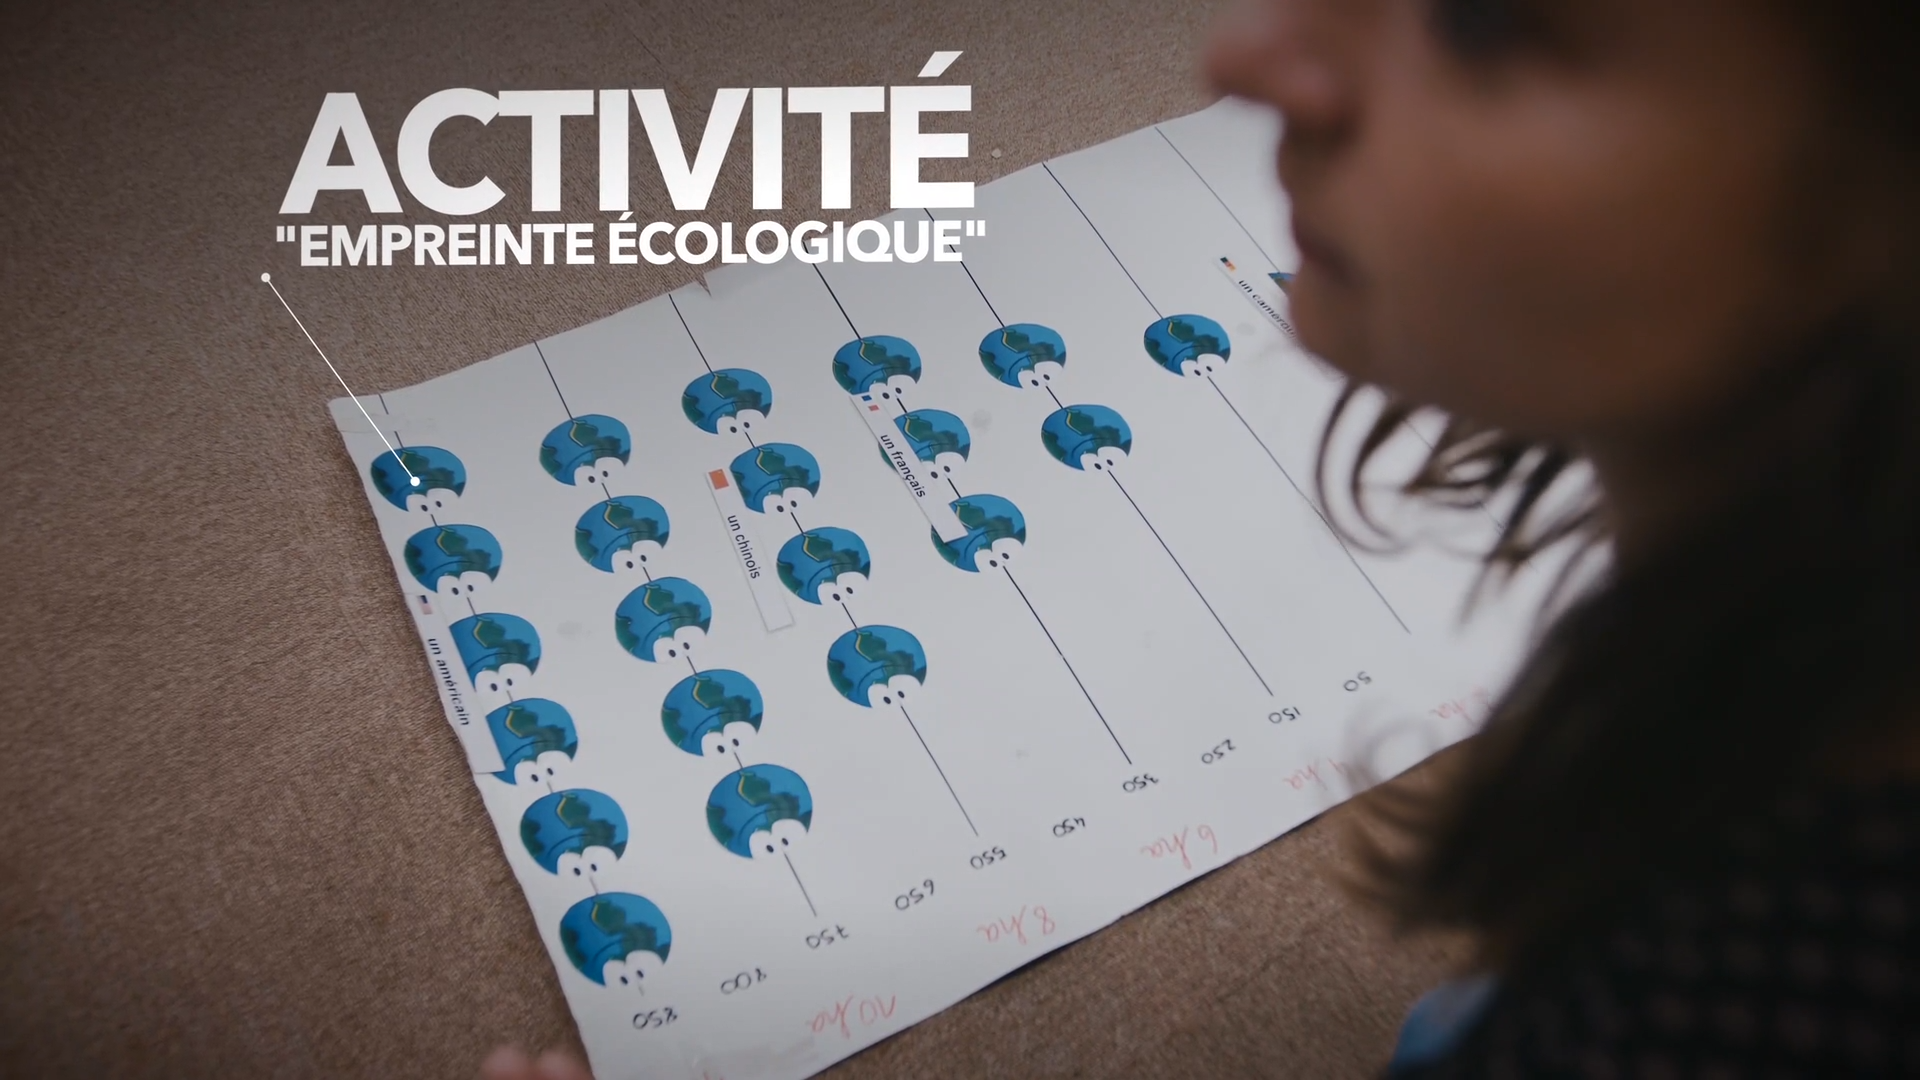 Activite_empreinte_ecologique